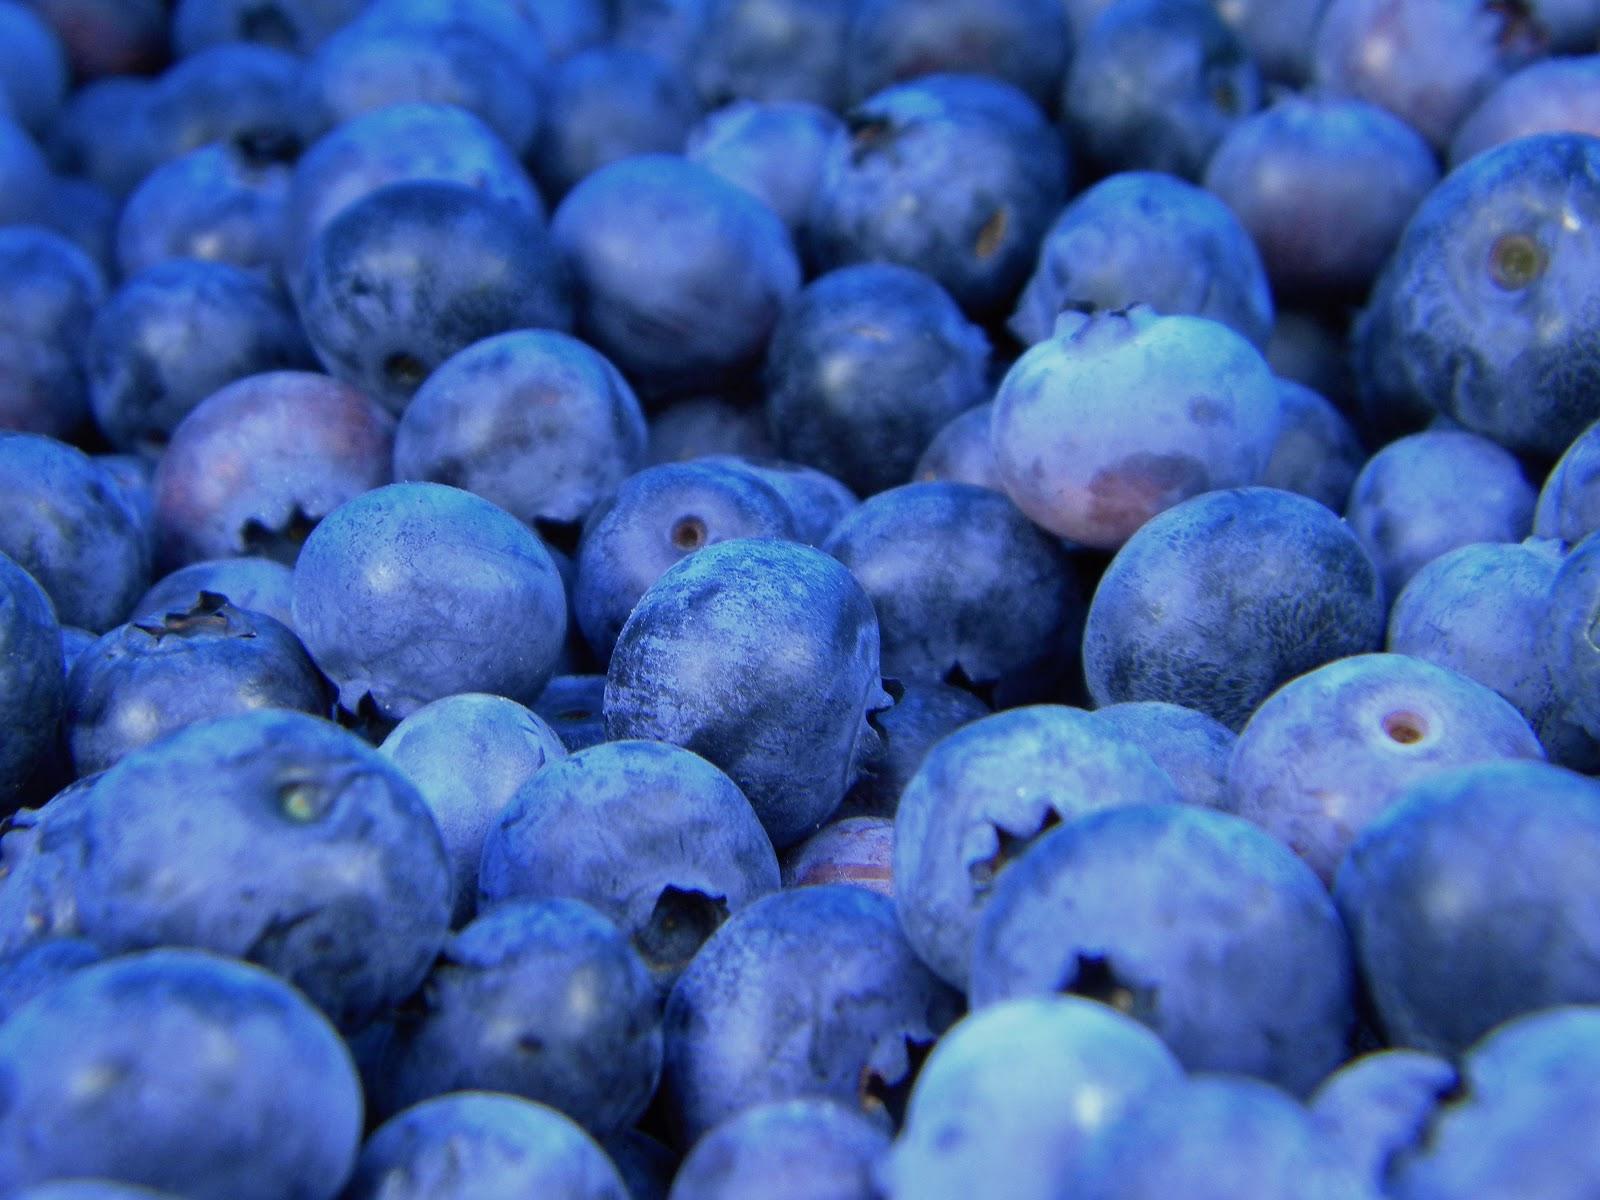 200+ Blue Color HD Images: Blue is the color of Sympathy